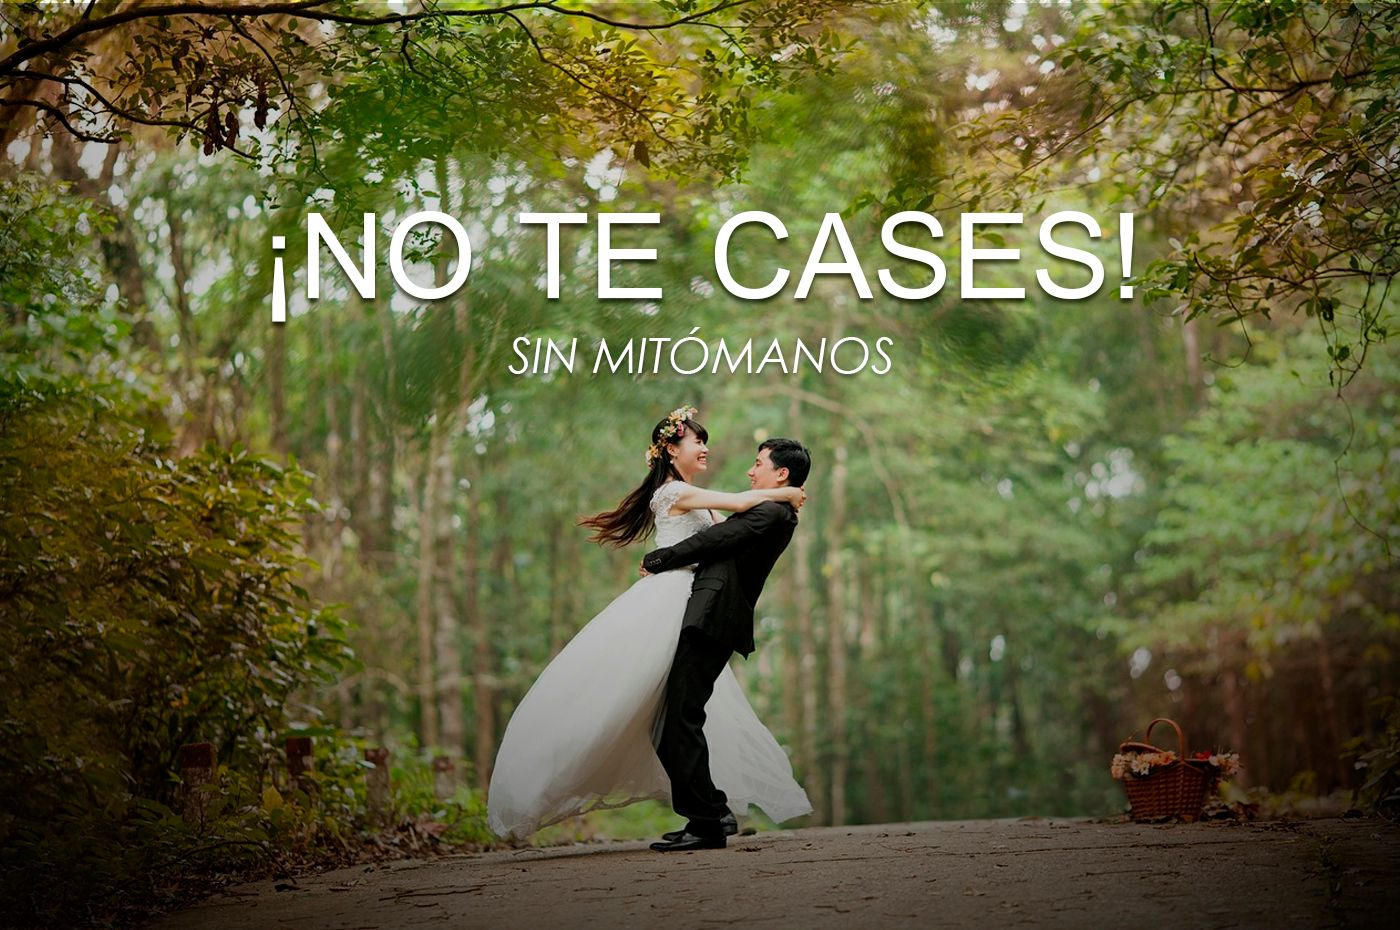 ¡No te cases!